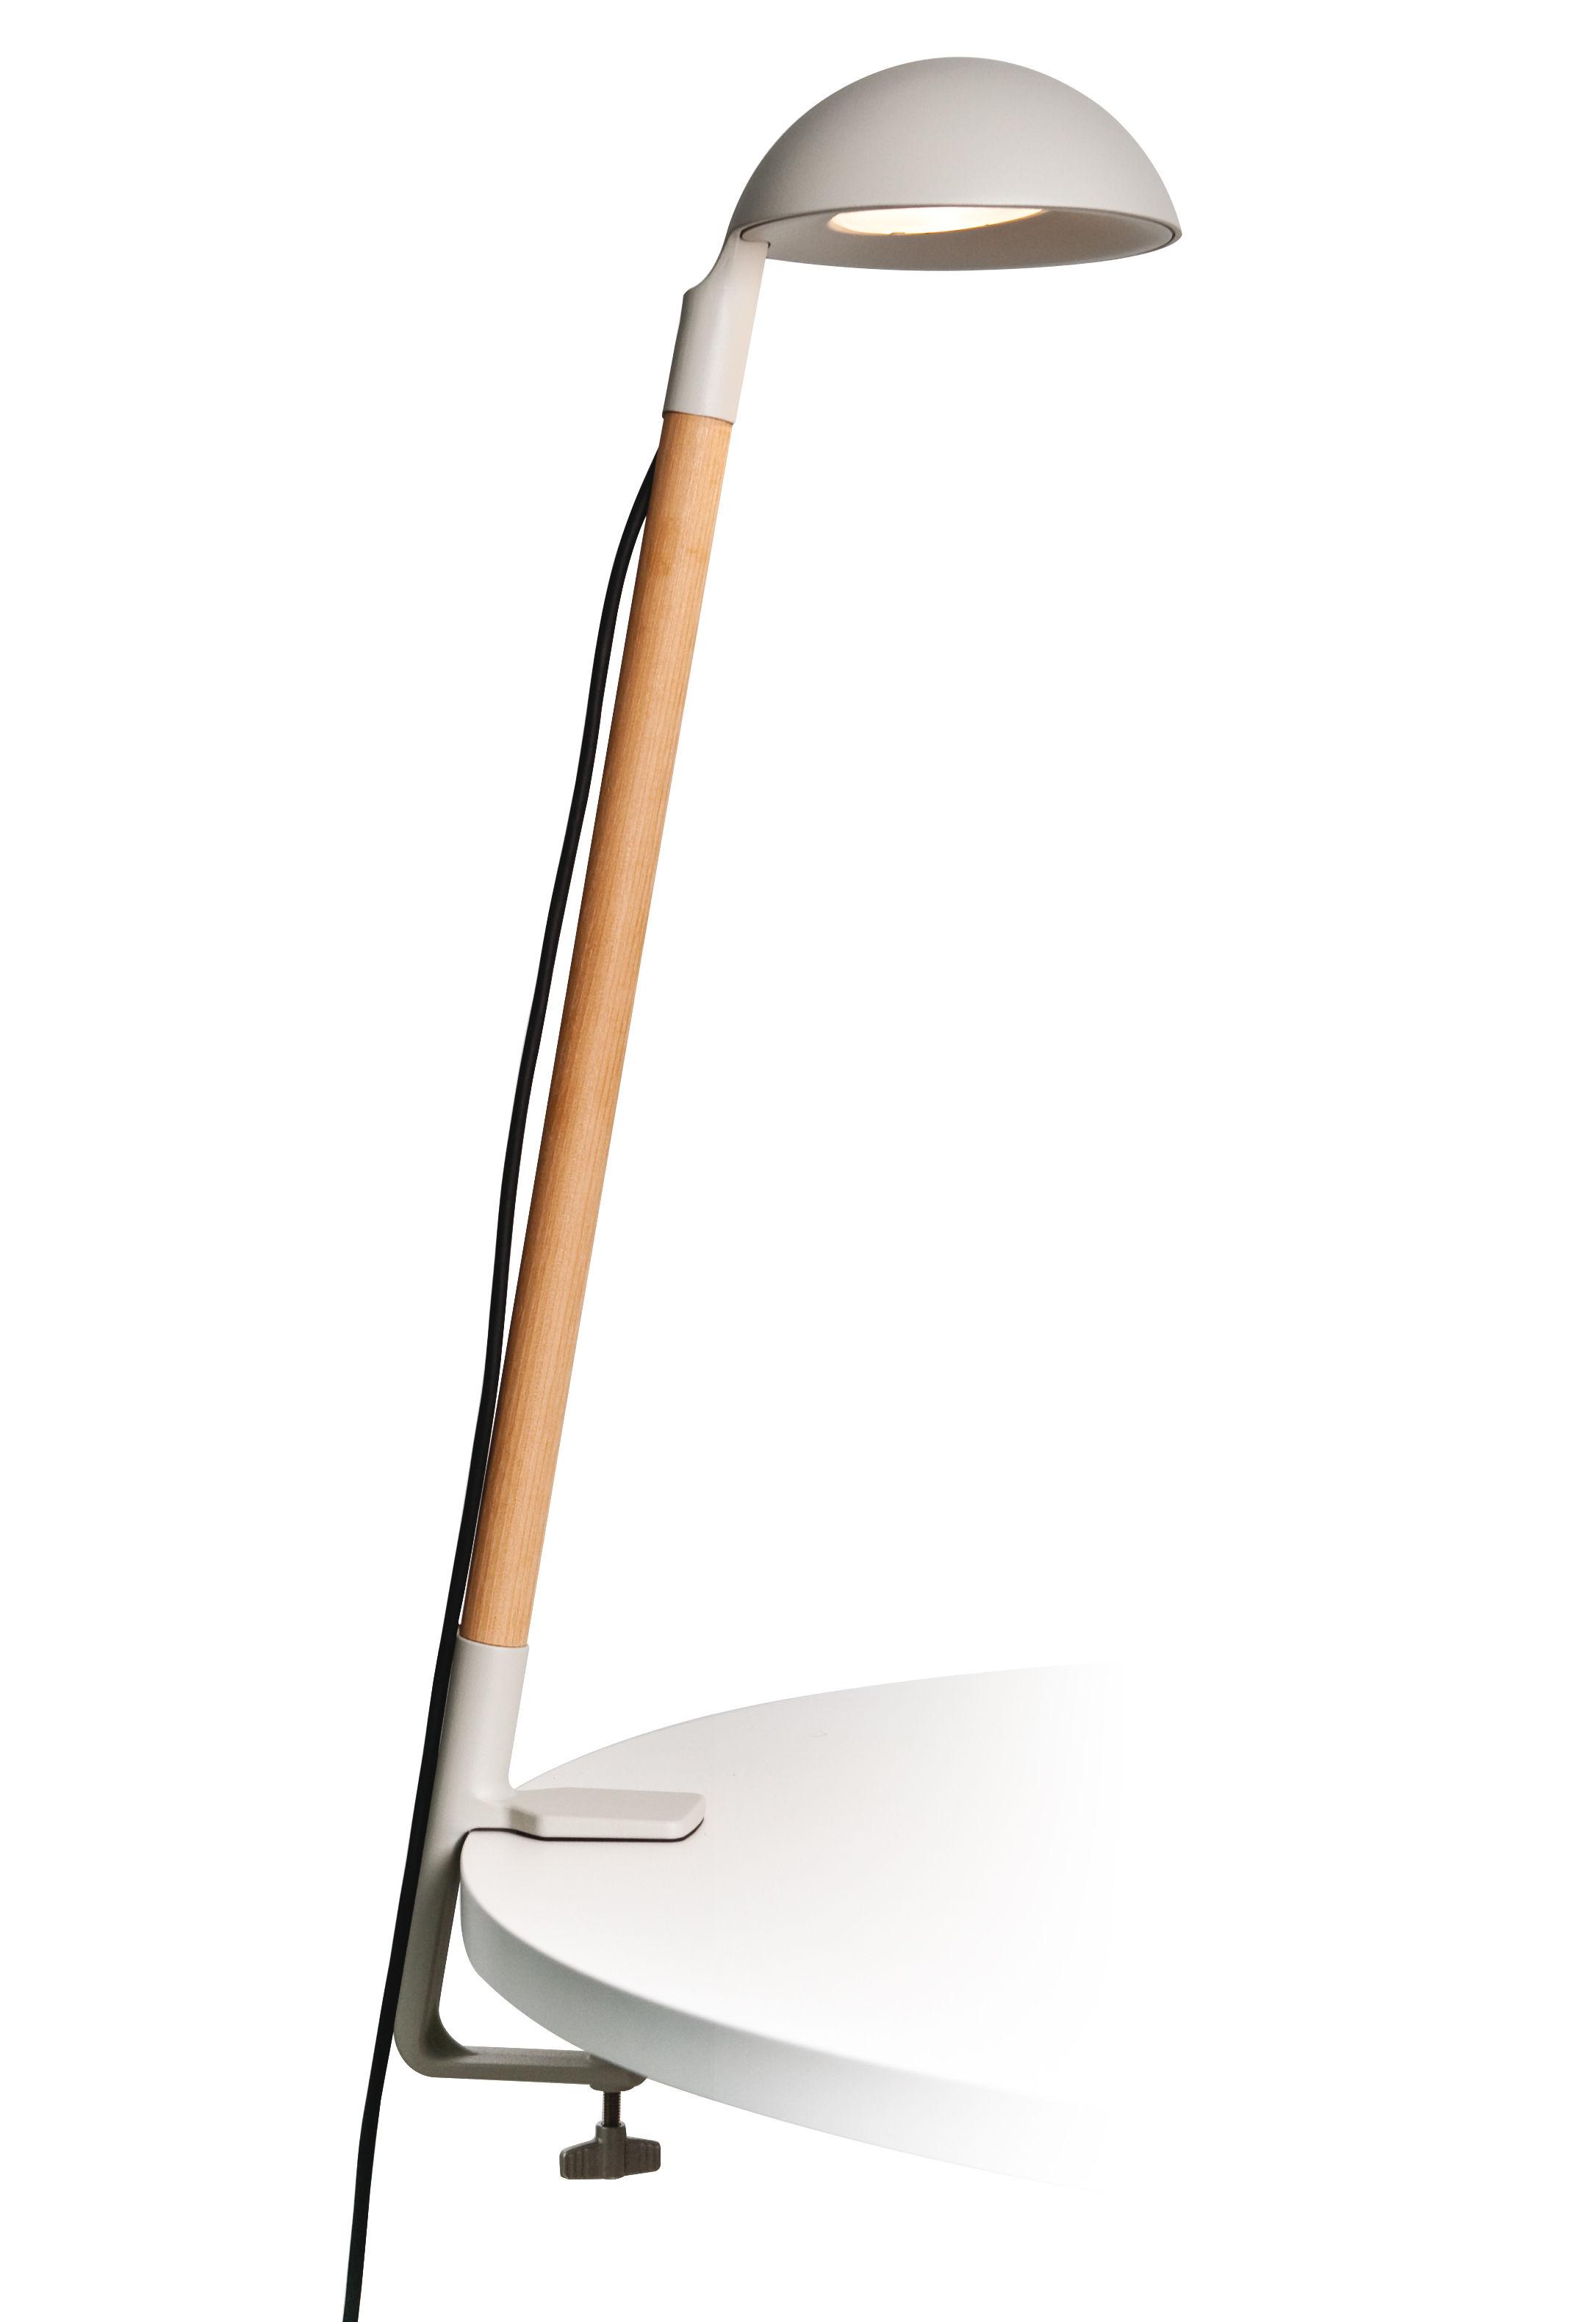 Lighting - Table Lamps - Tools Lamp by Roger Pradier - Light grey - Accacia wood, Aluminium